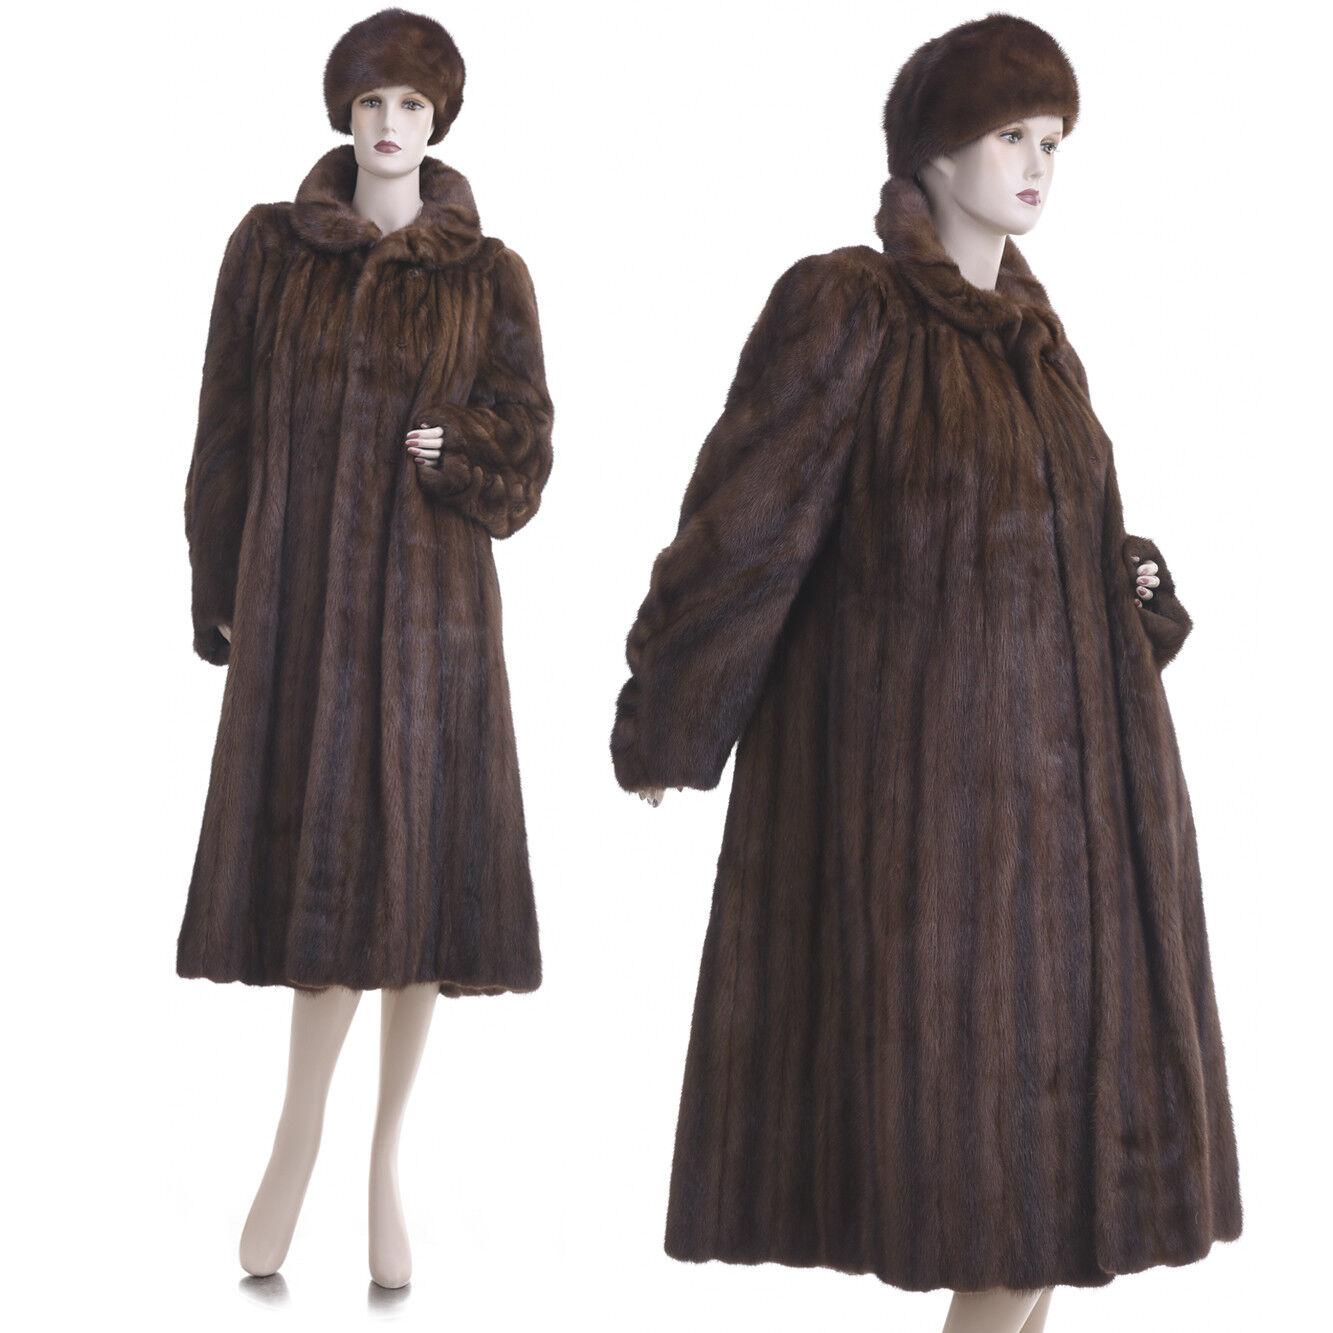 Mint  L  Couture Chocolate Brown Female Female Female Mink Fur Pleated Swing Coat w Free Hat 160b67